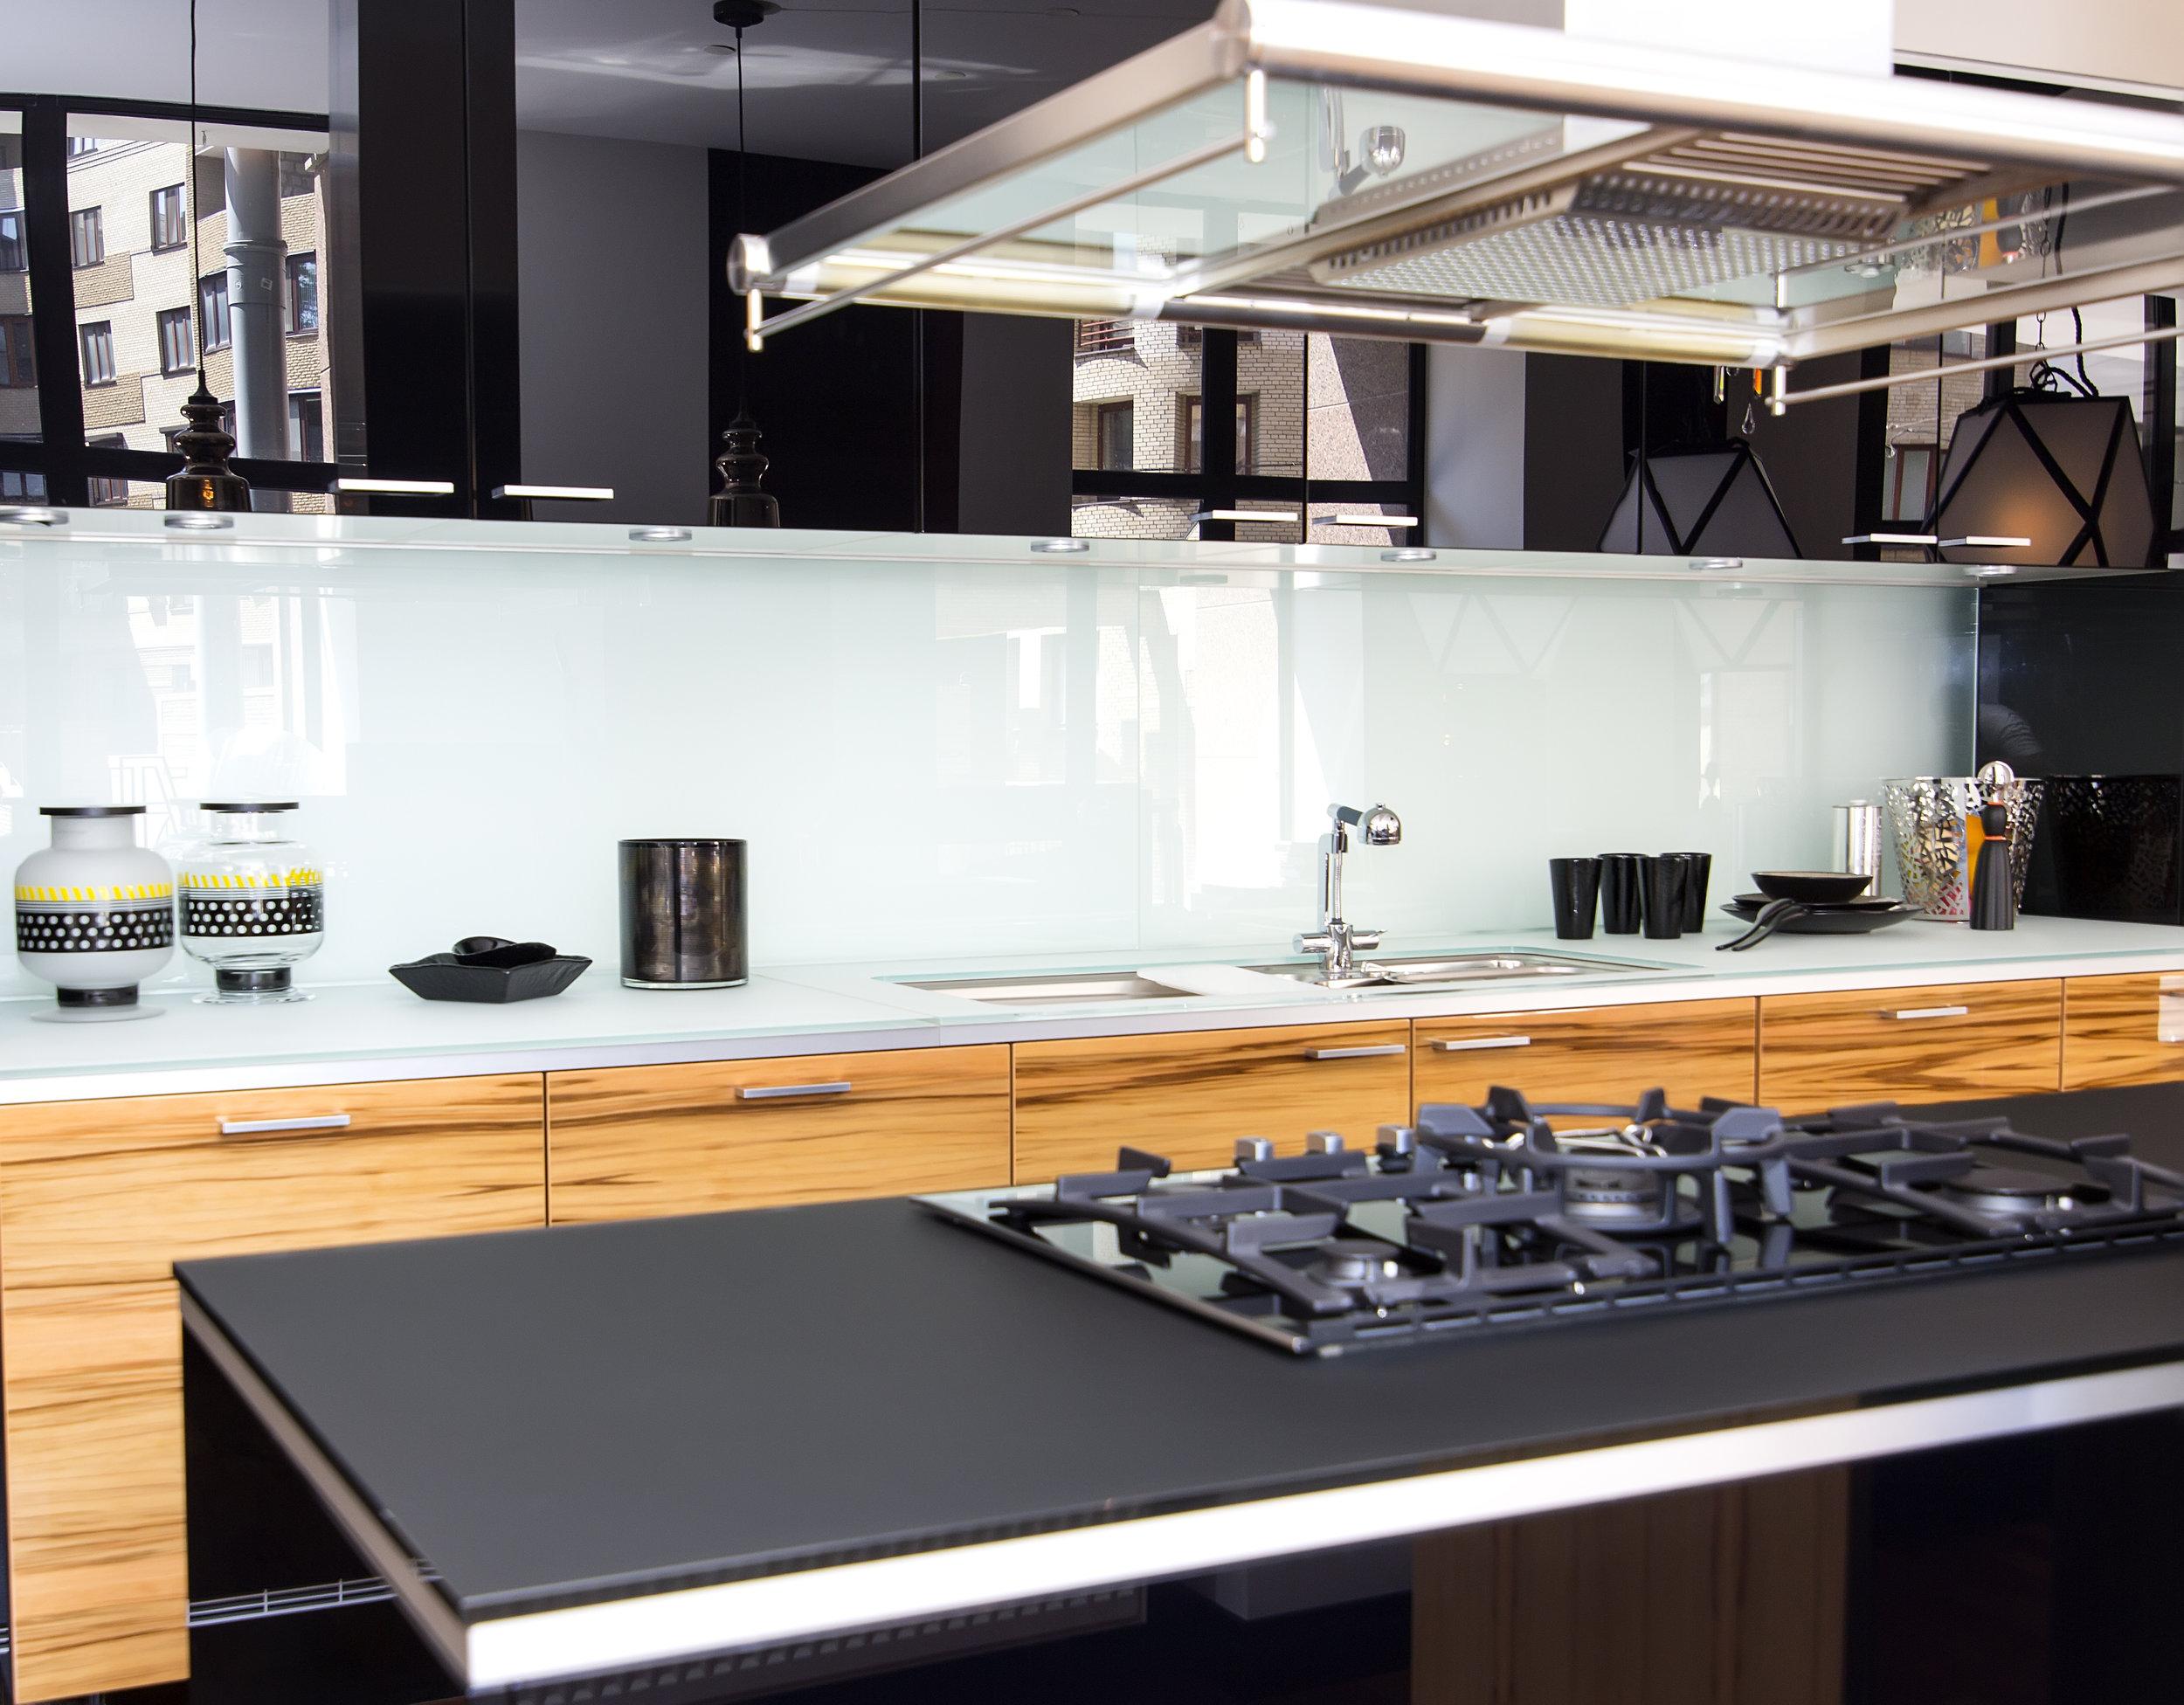 bigstock-kitchen-59166656.jpg